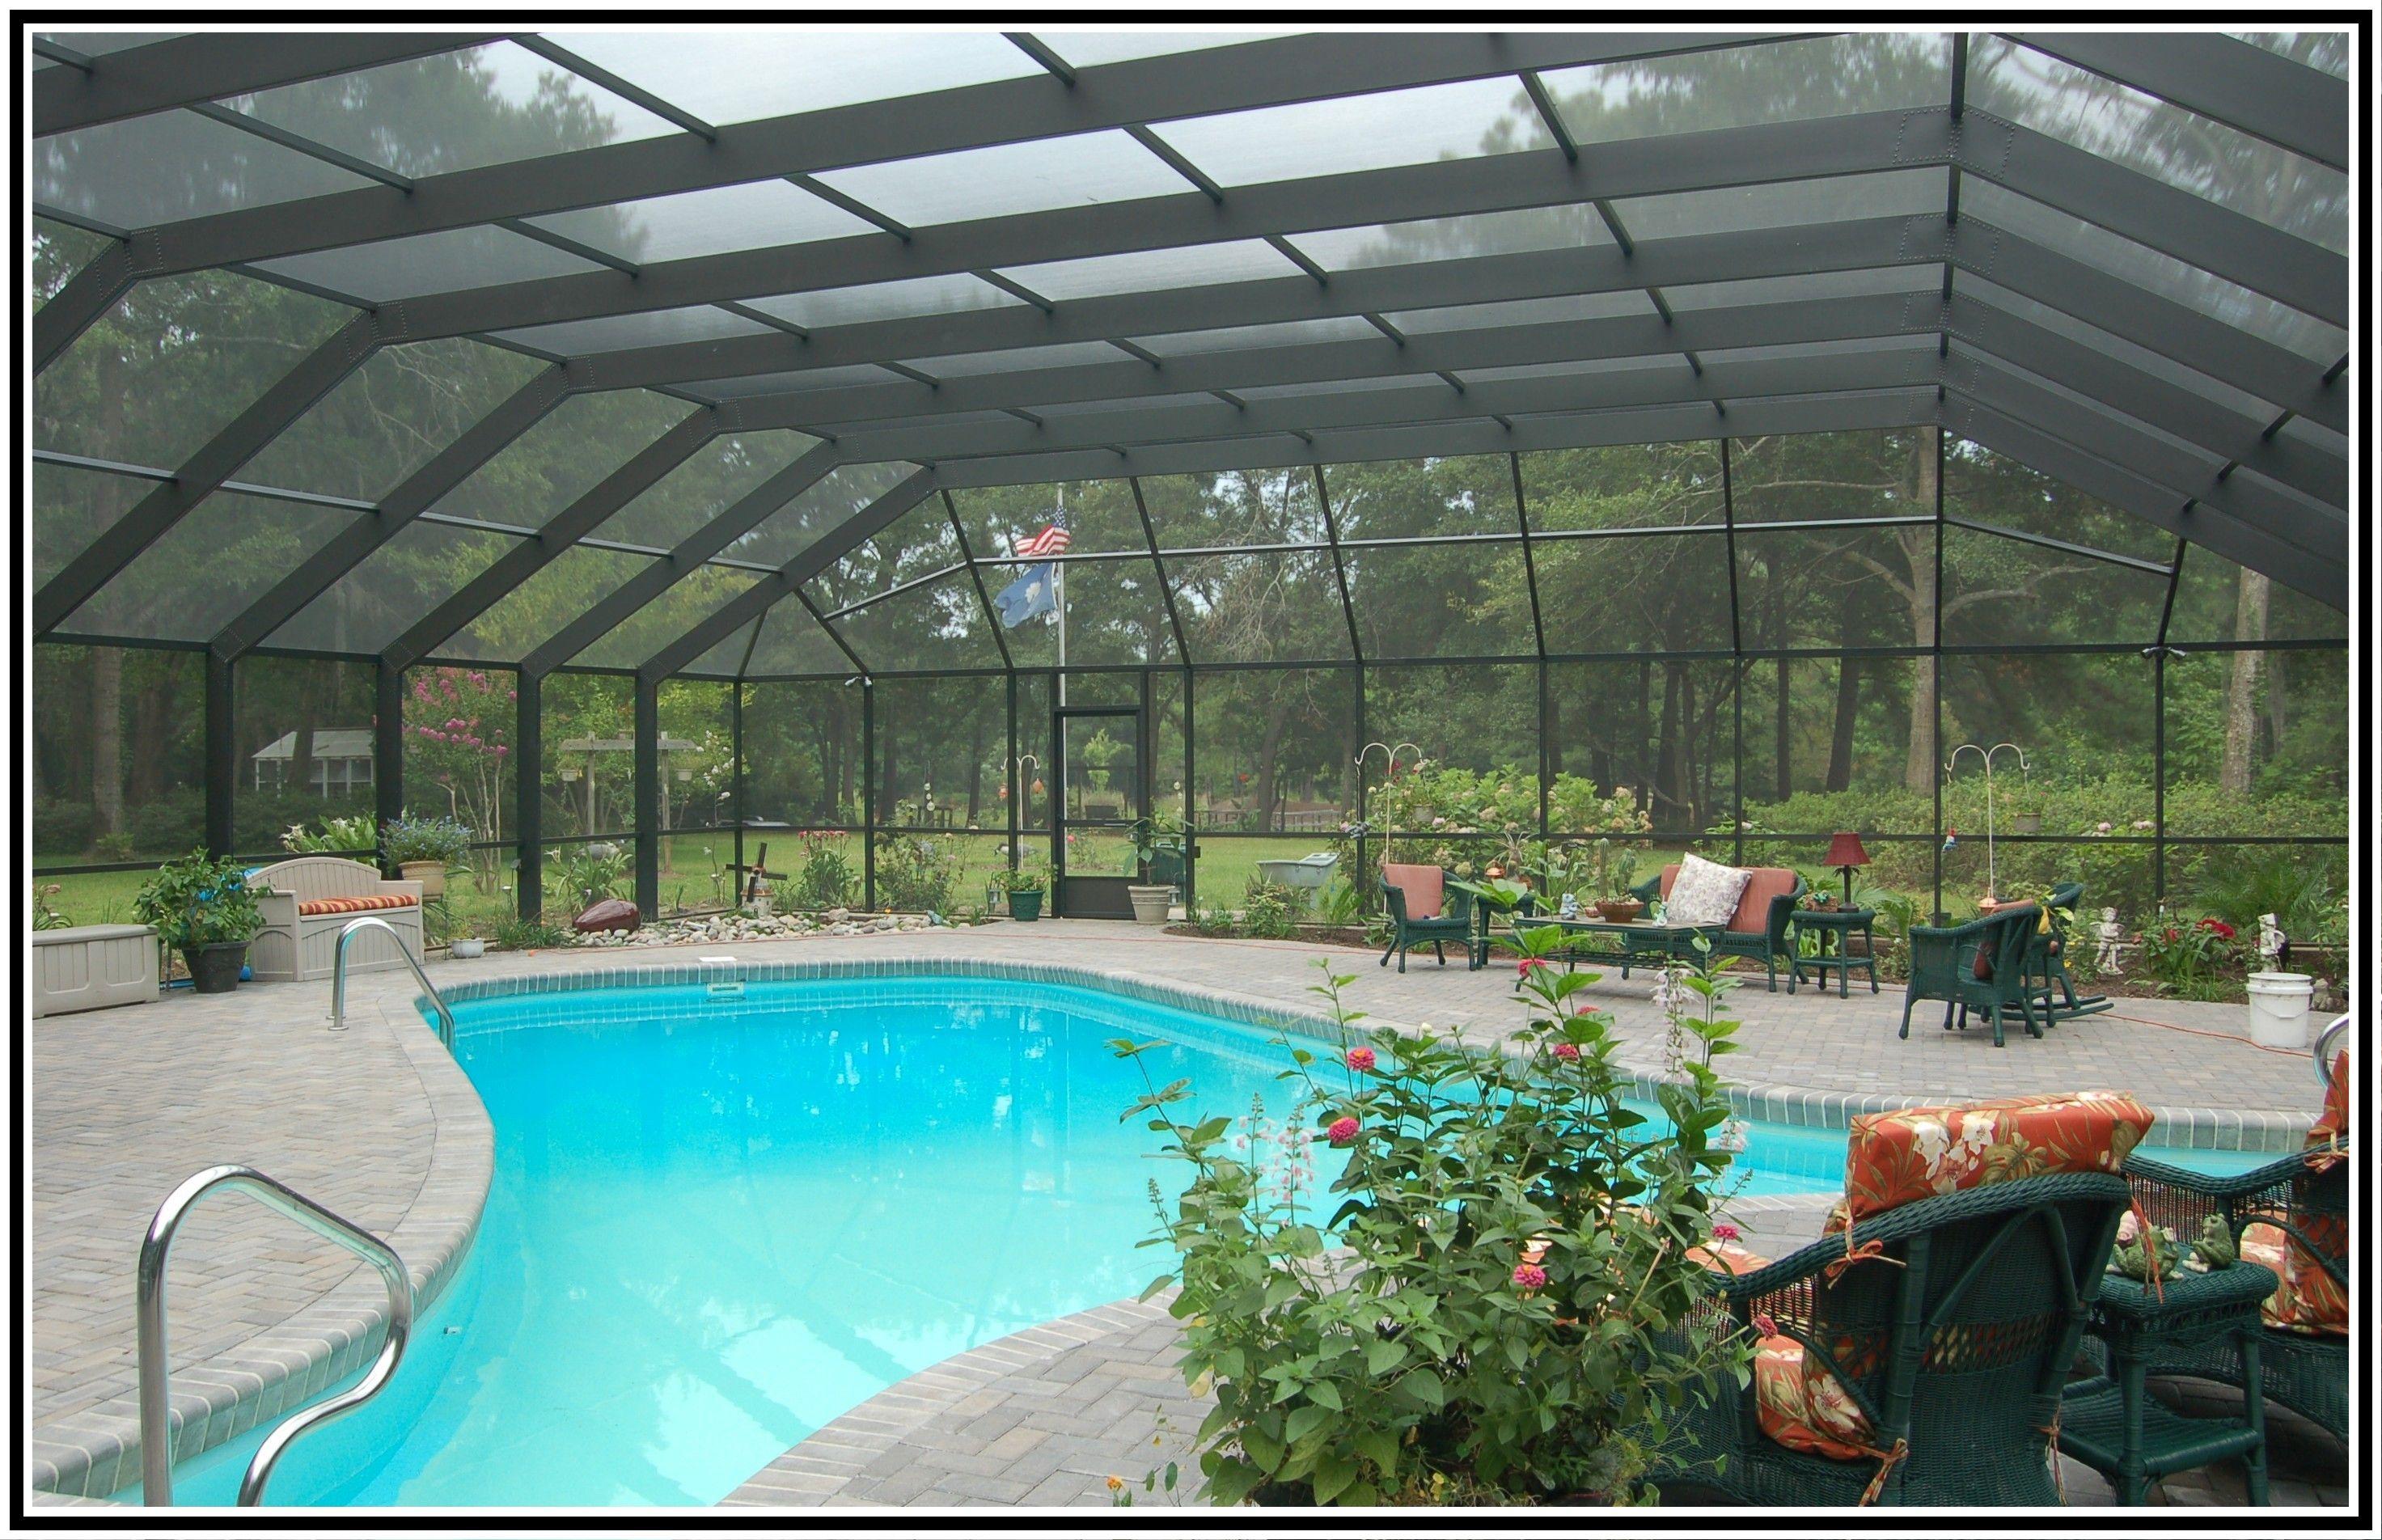 Pool Enclosure Design Enclosures And Screen Rooms